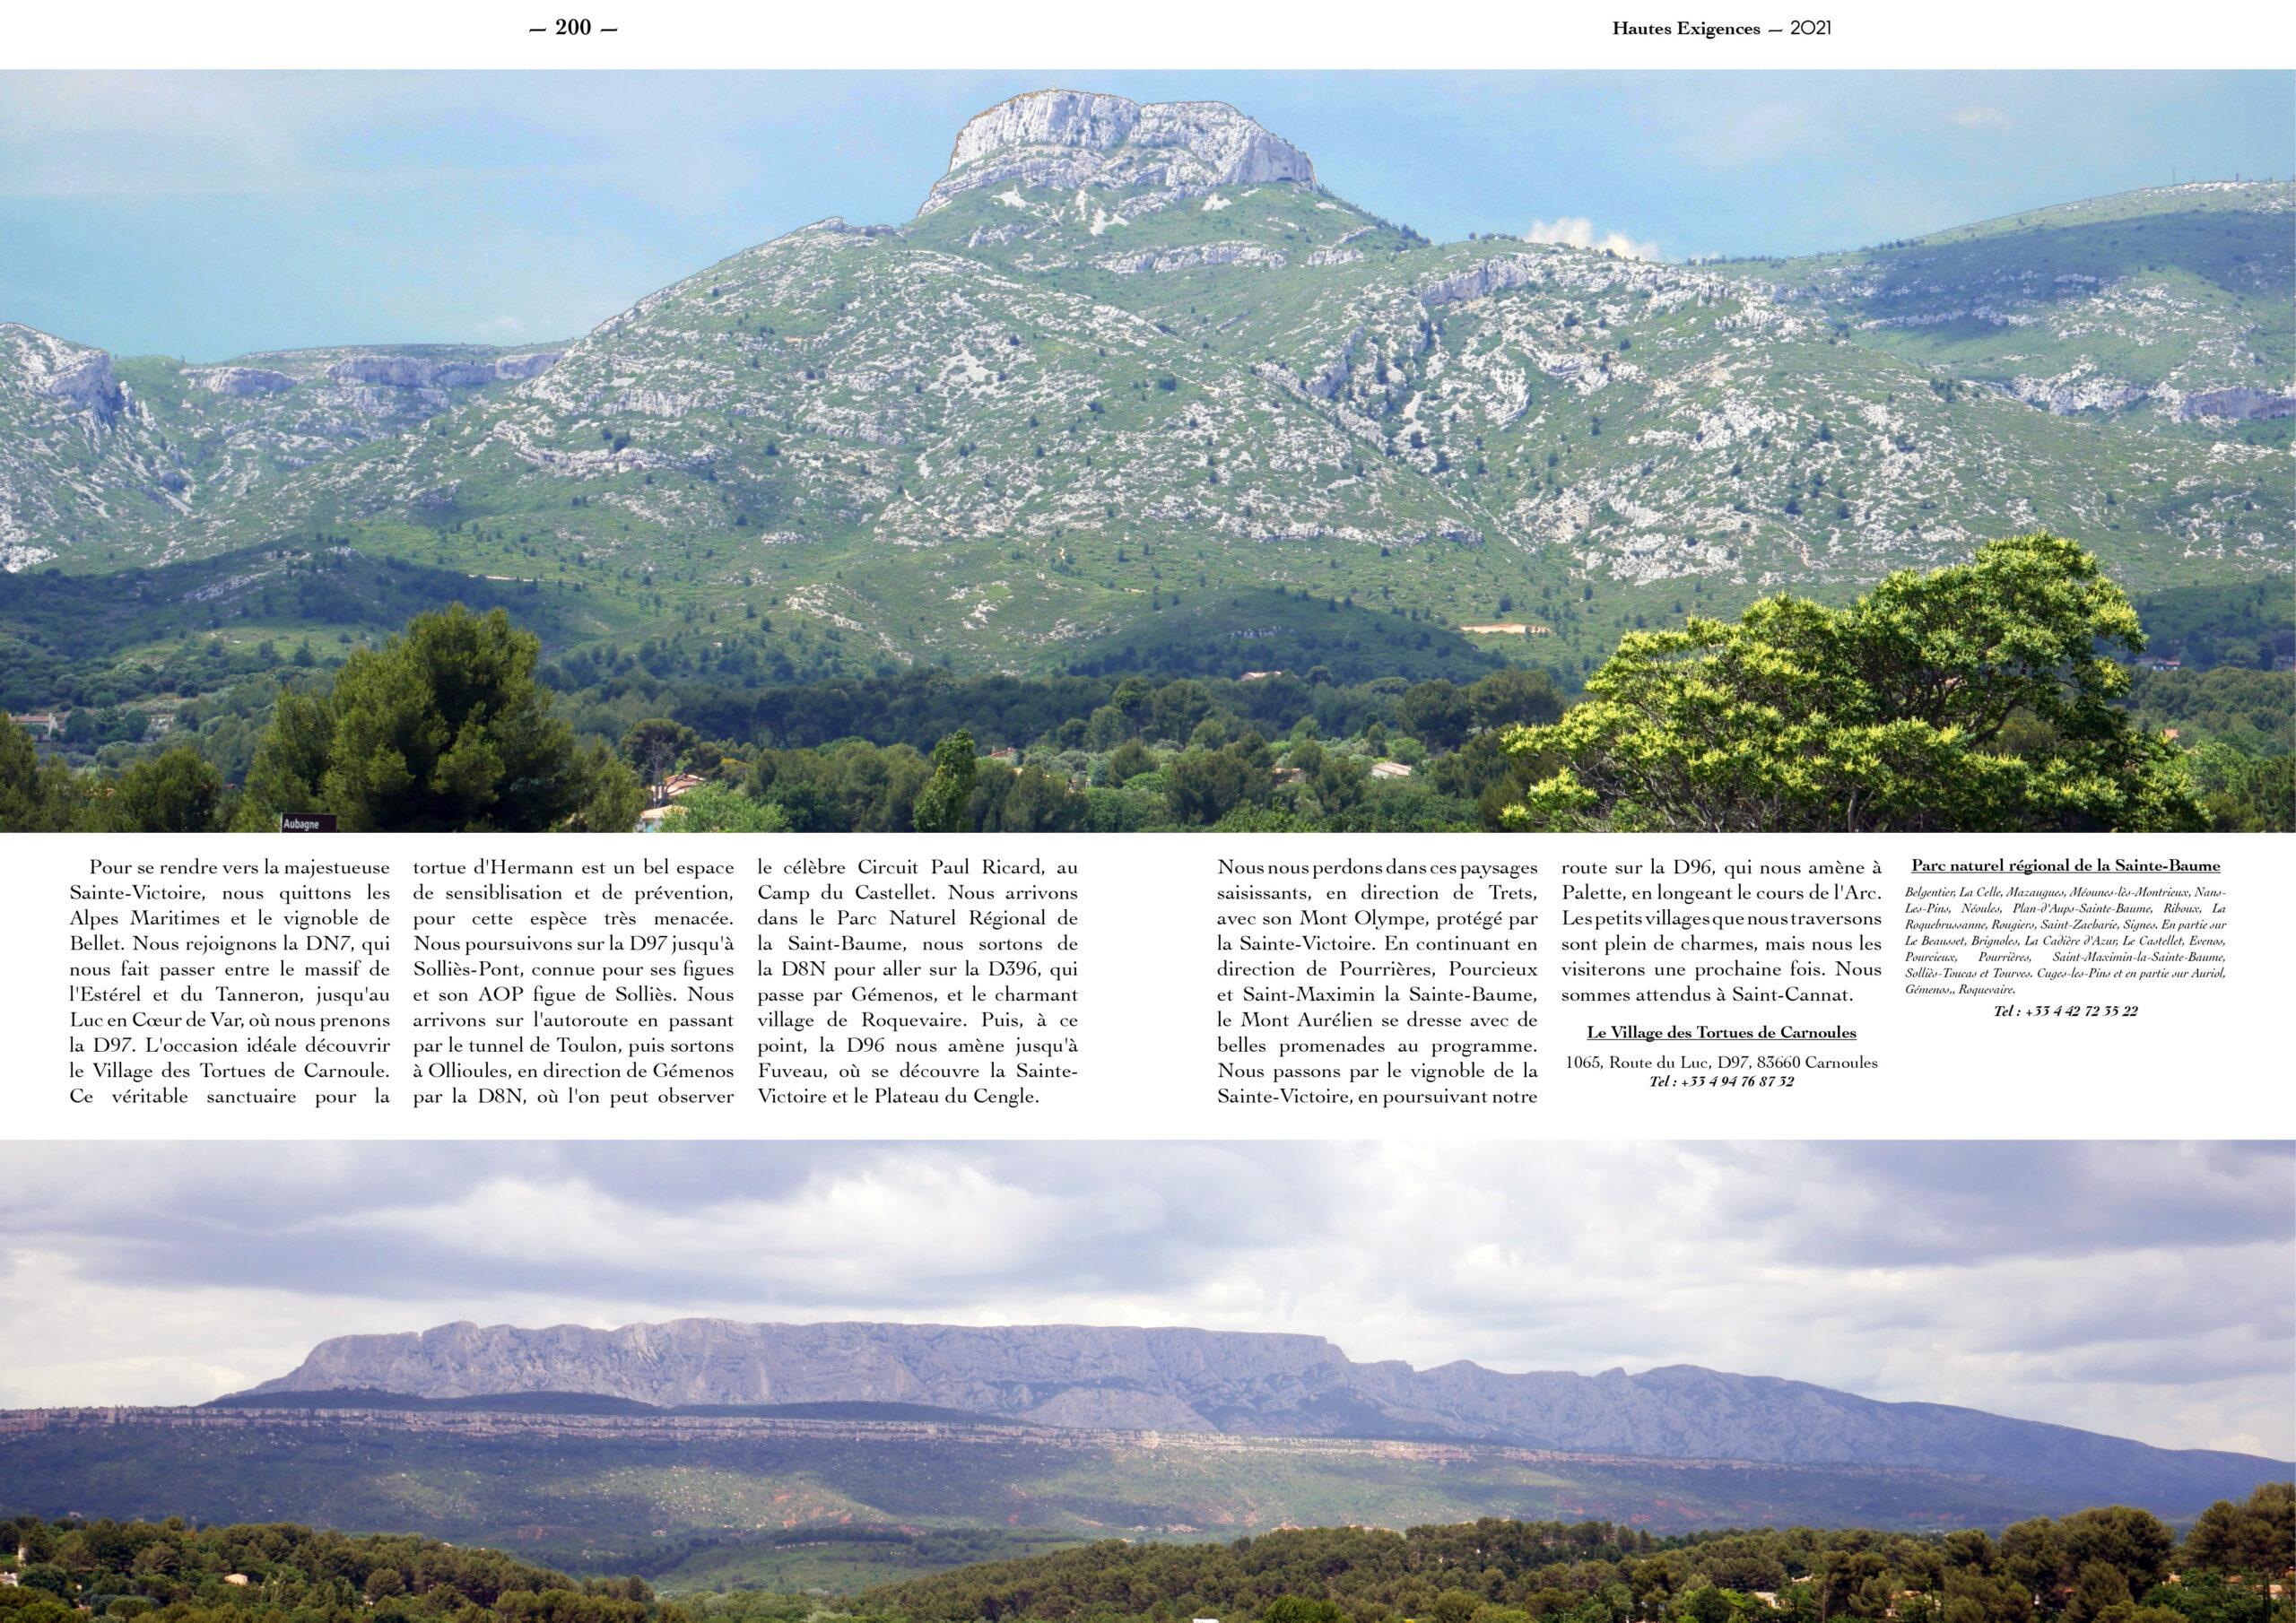 Hautes Exigences Magazine Hors Serie 2021 page 198-199